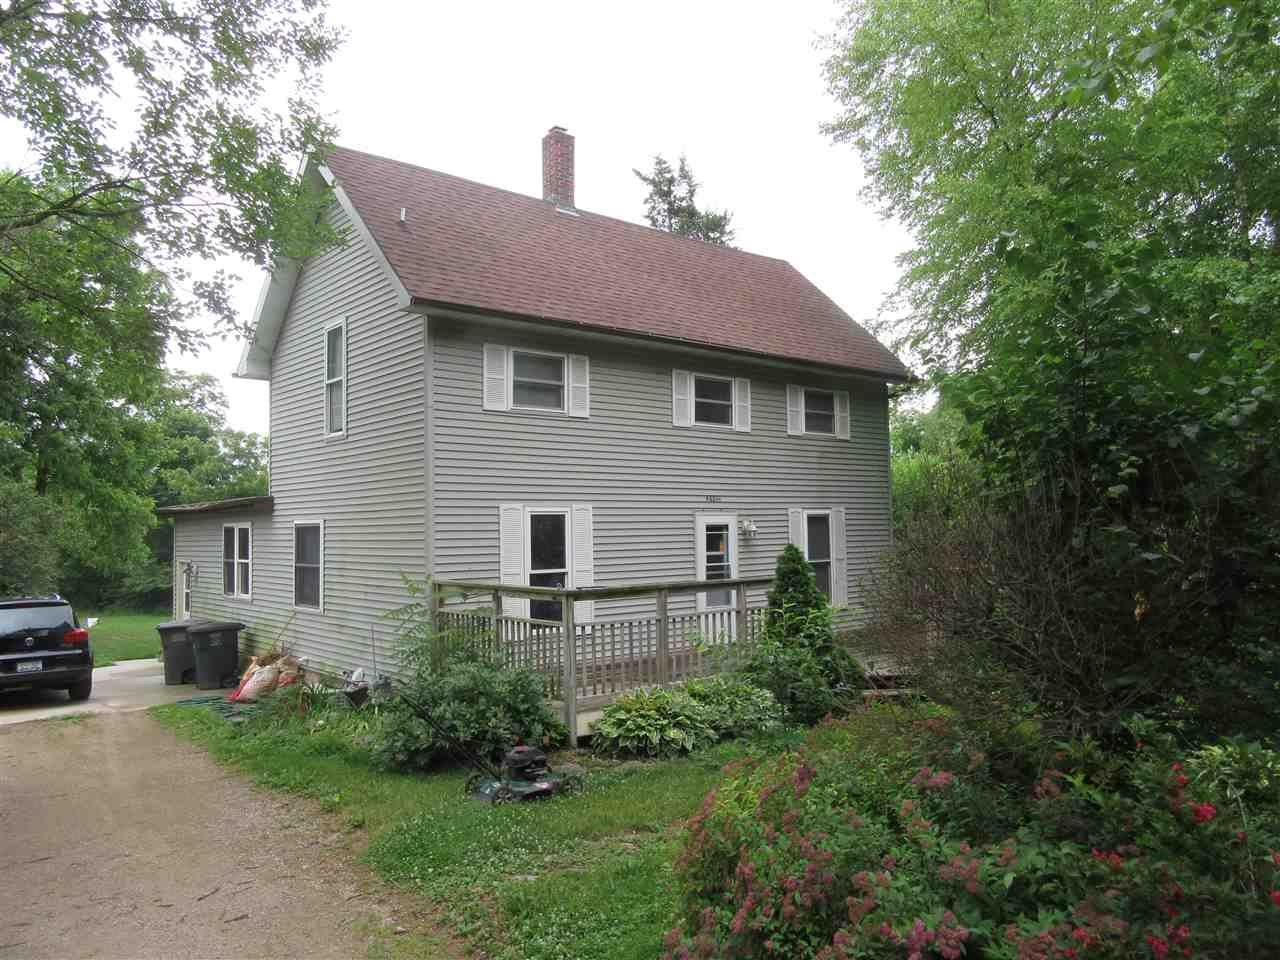 N6844 County Road B, Lake Mills, WI 53551 - #: 1886975